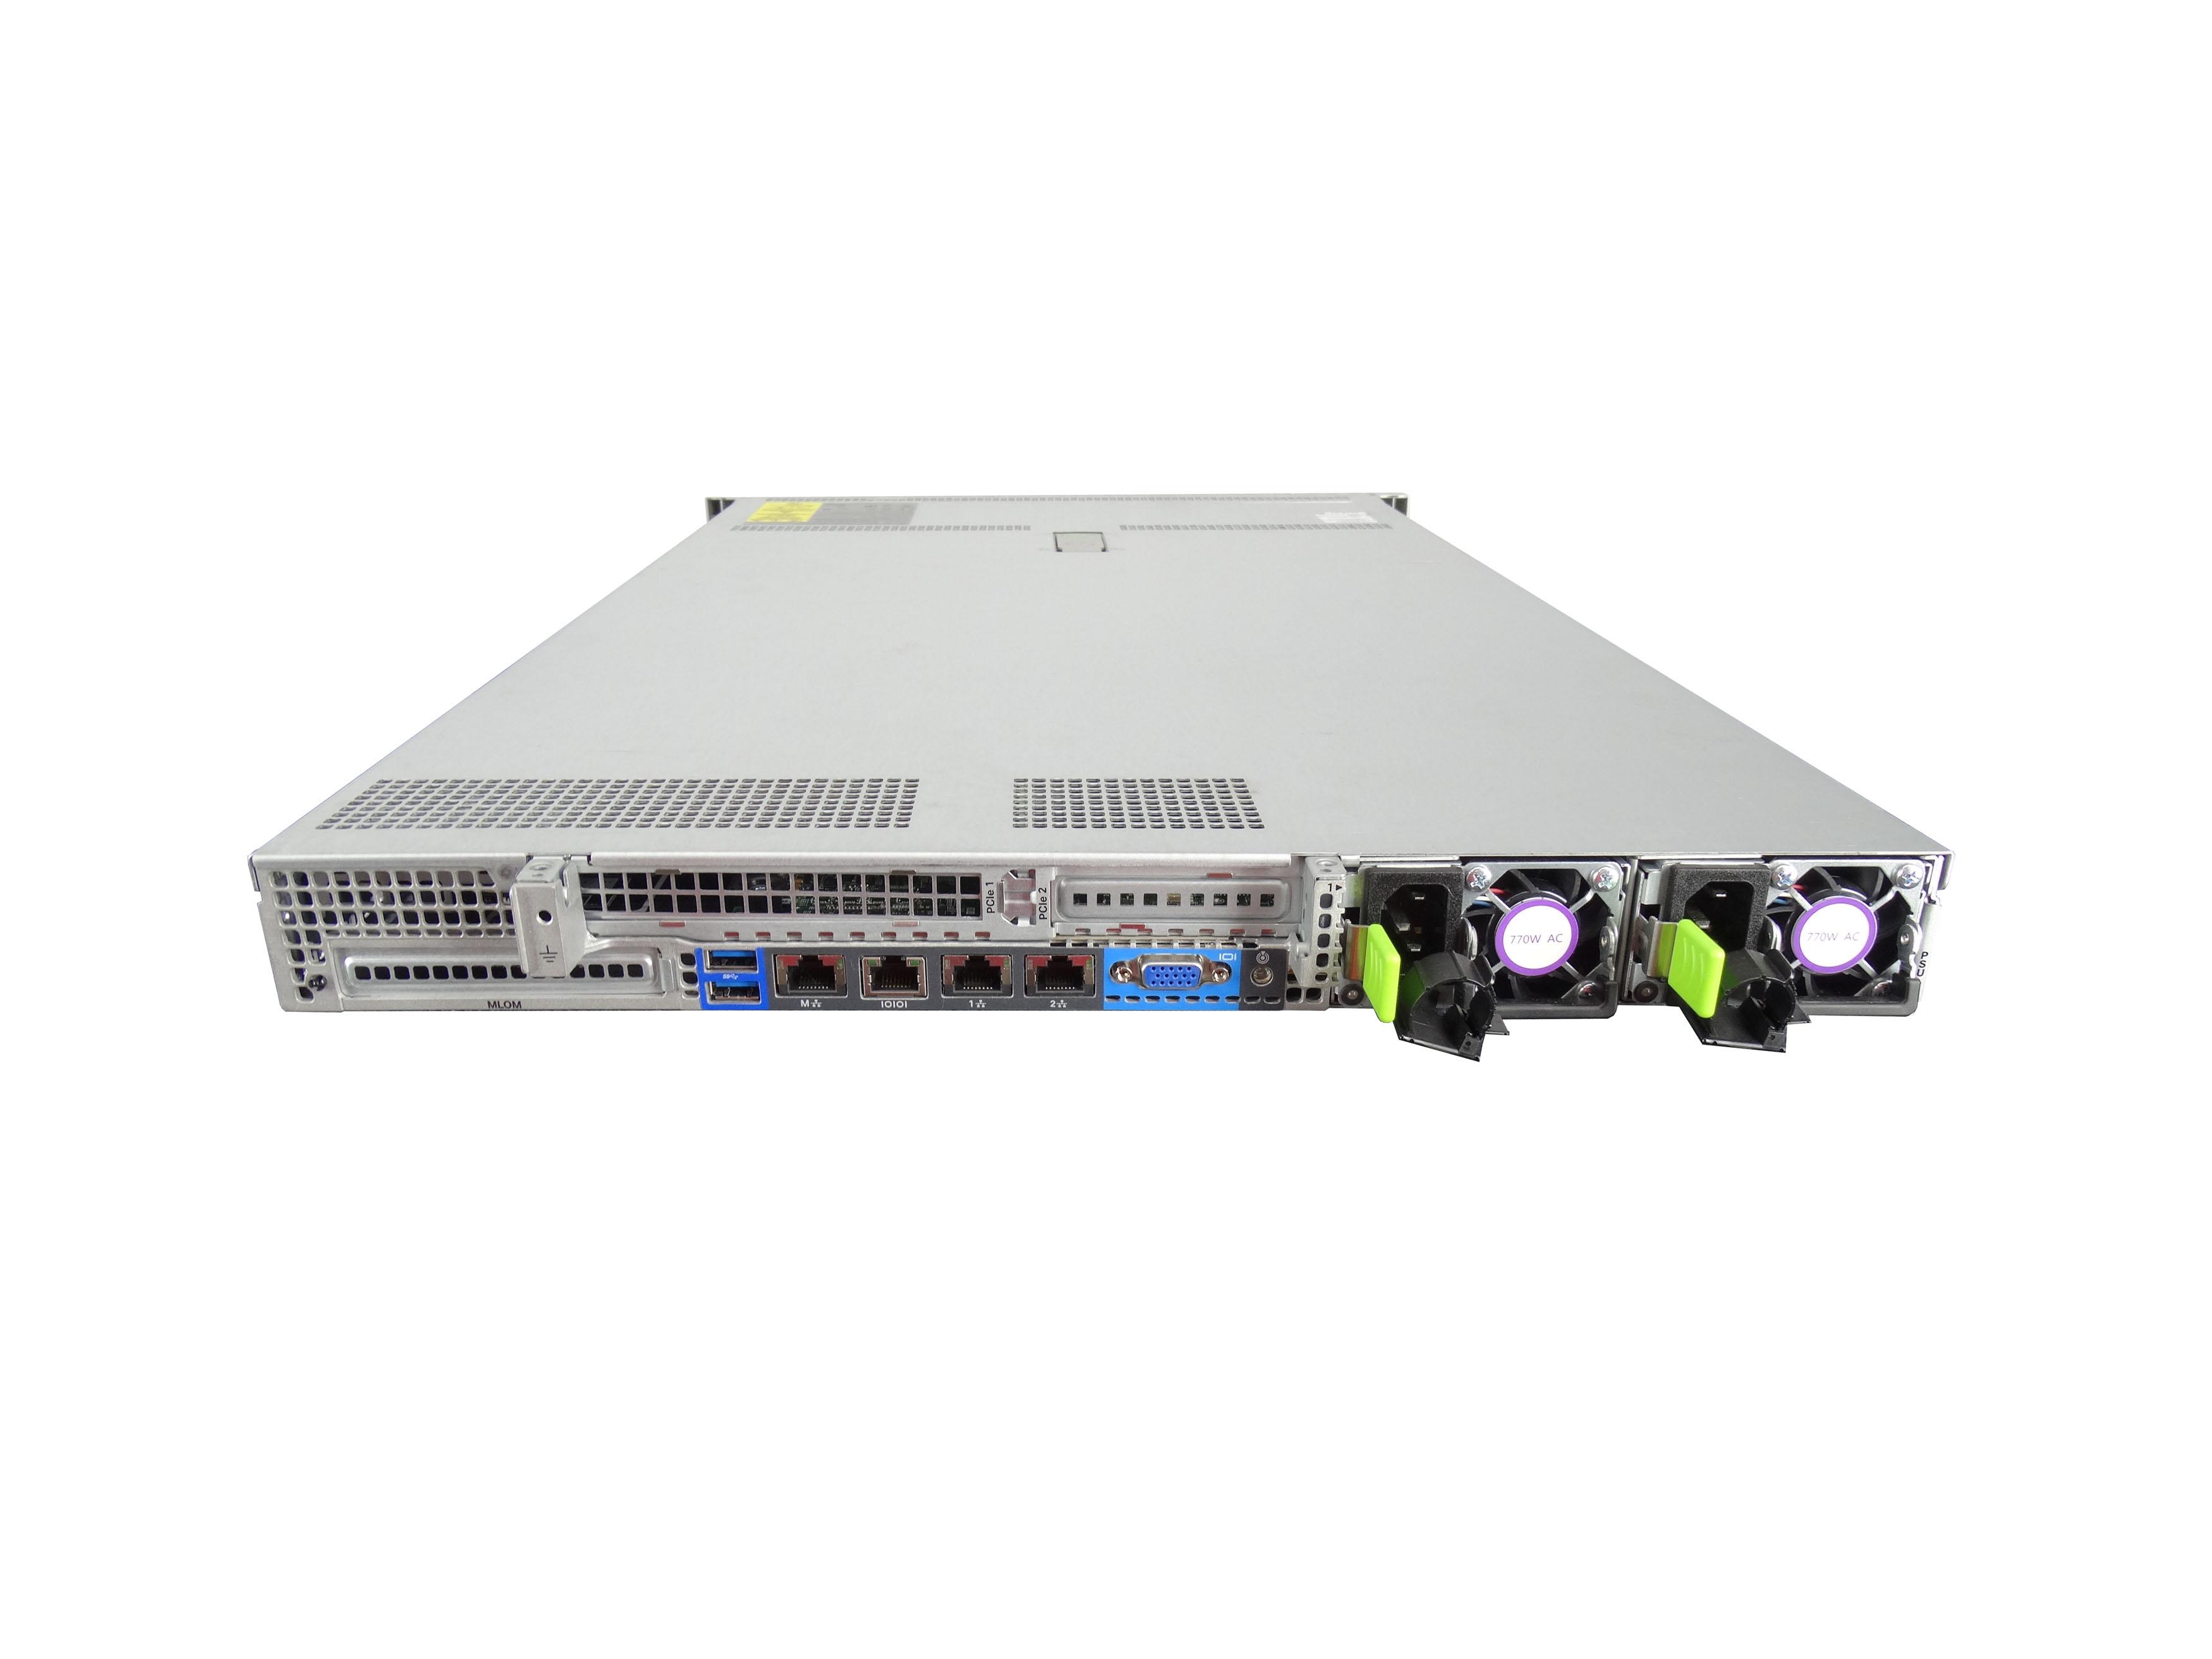 Details about Cisco UCS C220 M4 8-Bay SFF 2x E5-2680 V3 2 5GHz 12C 48GB 4x  1TB SAS